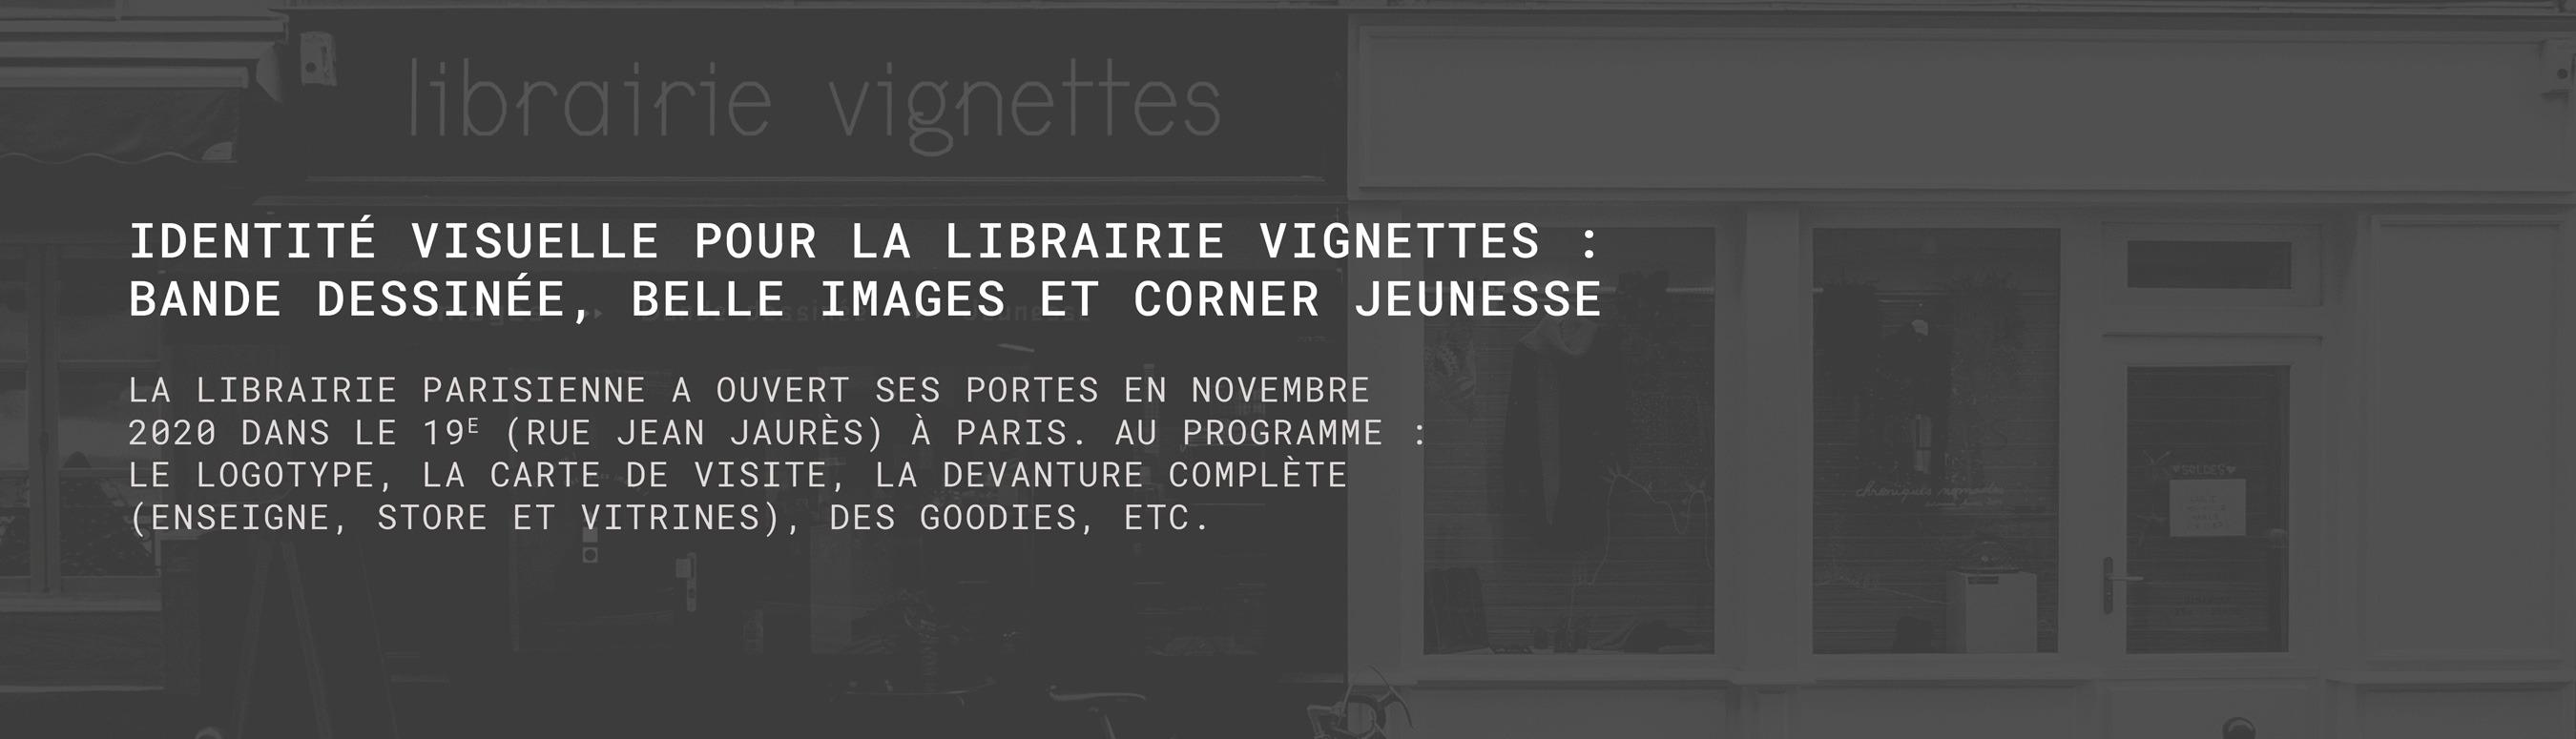 Librairie Vignettes 1